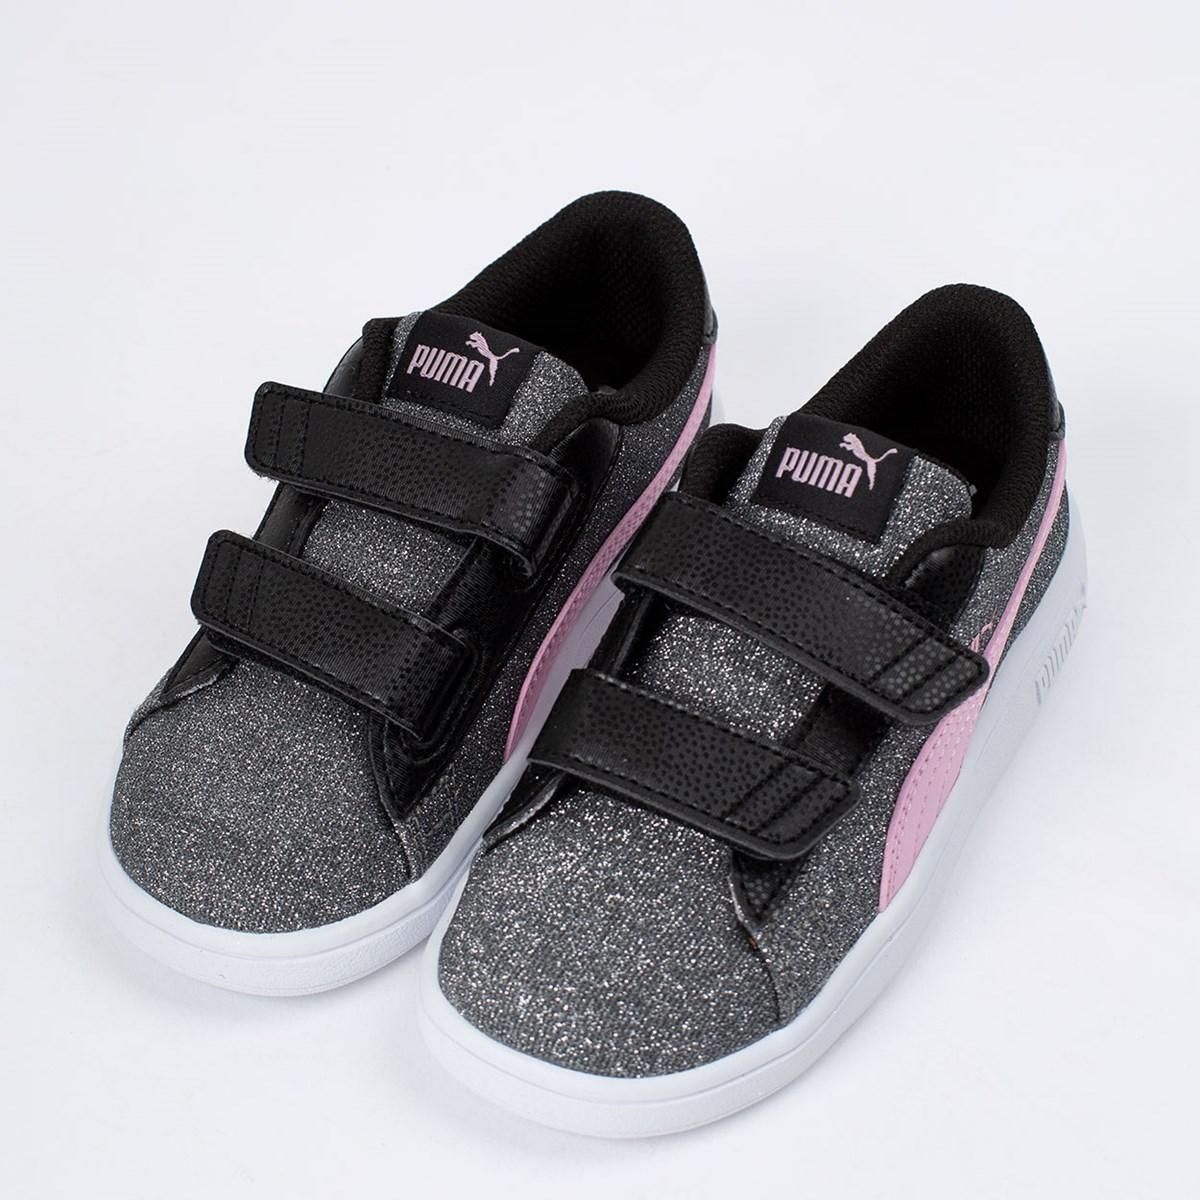 Tênis Puma Kids Smash V2 Glitz Glam V Black Pale Pink 367380-18